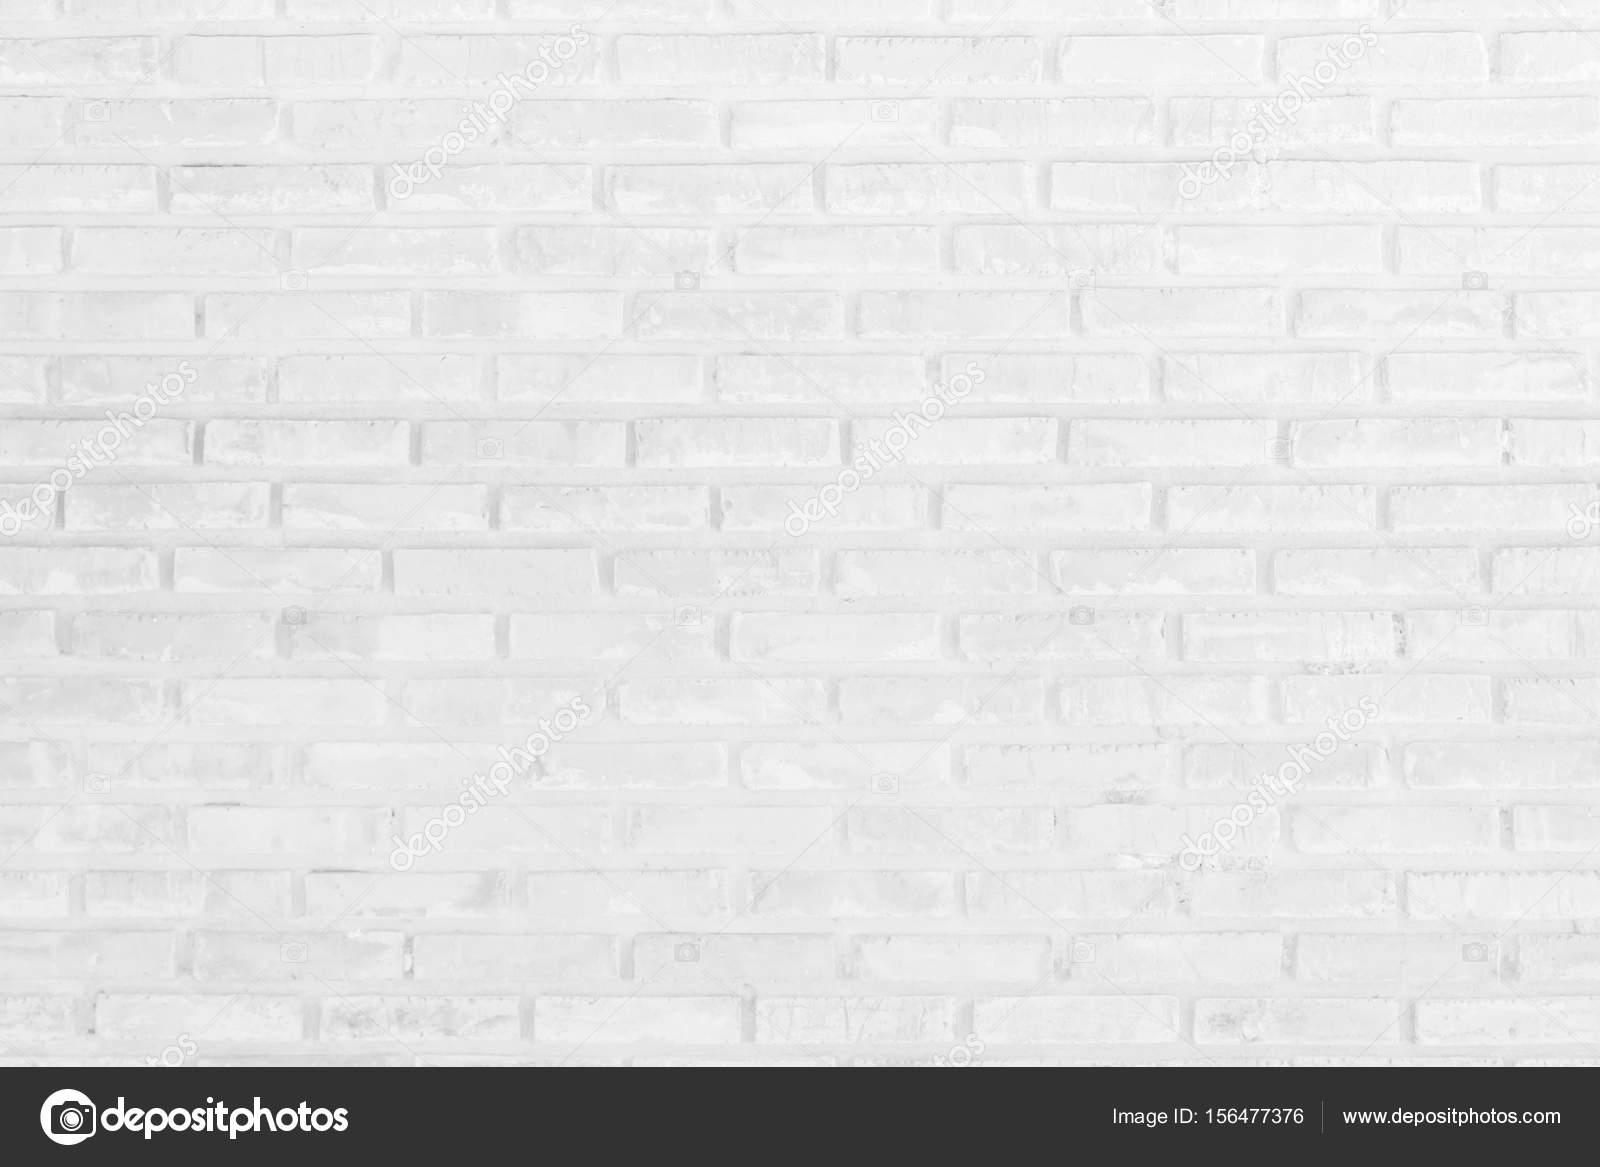 Sfondo texture muro di mattoni bianchi e neri u foto stock